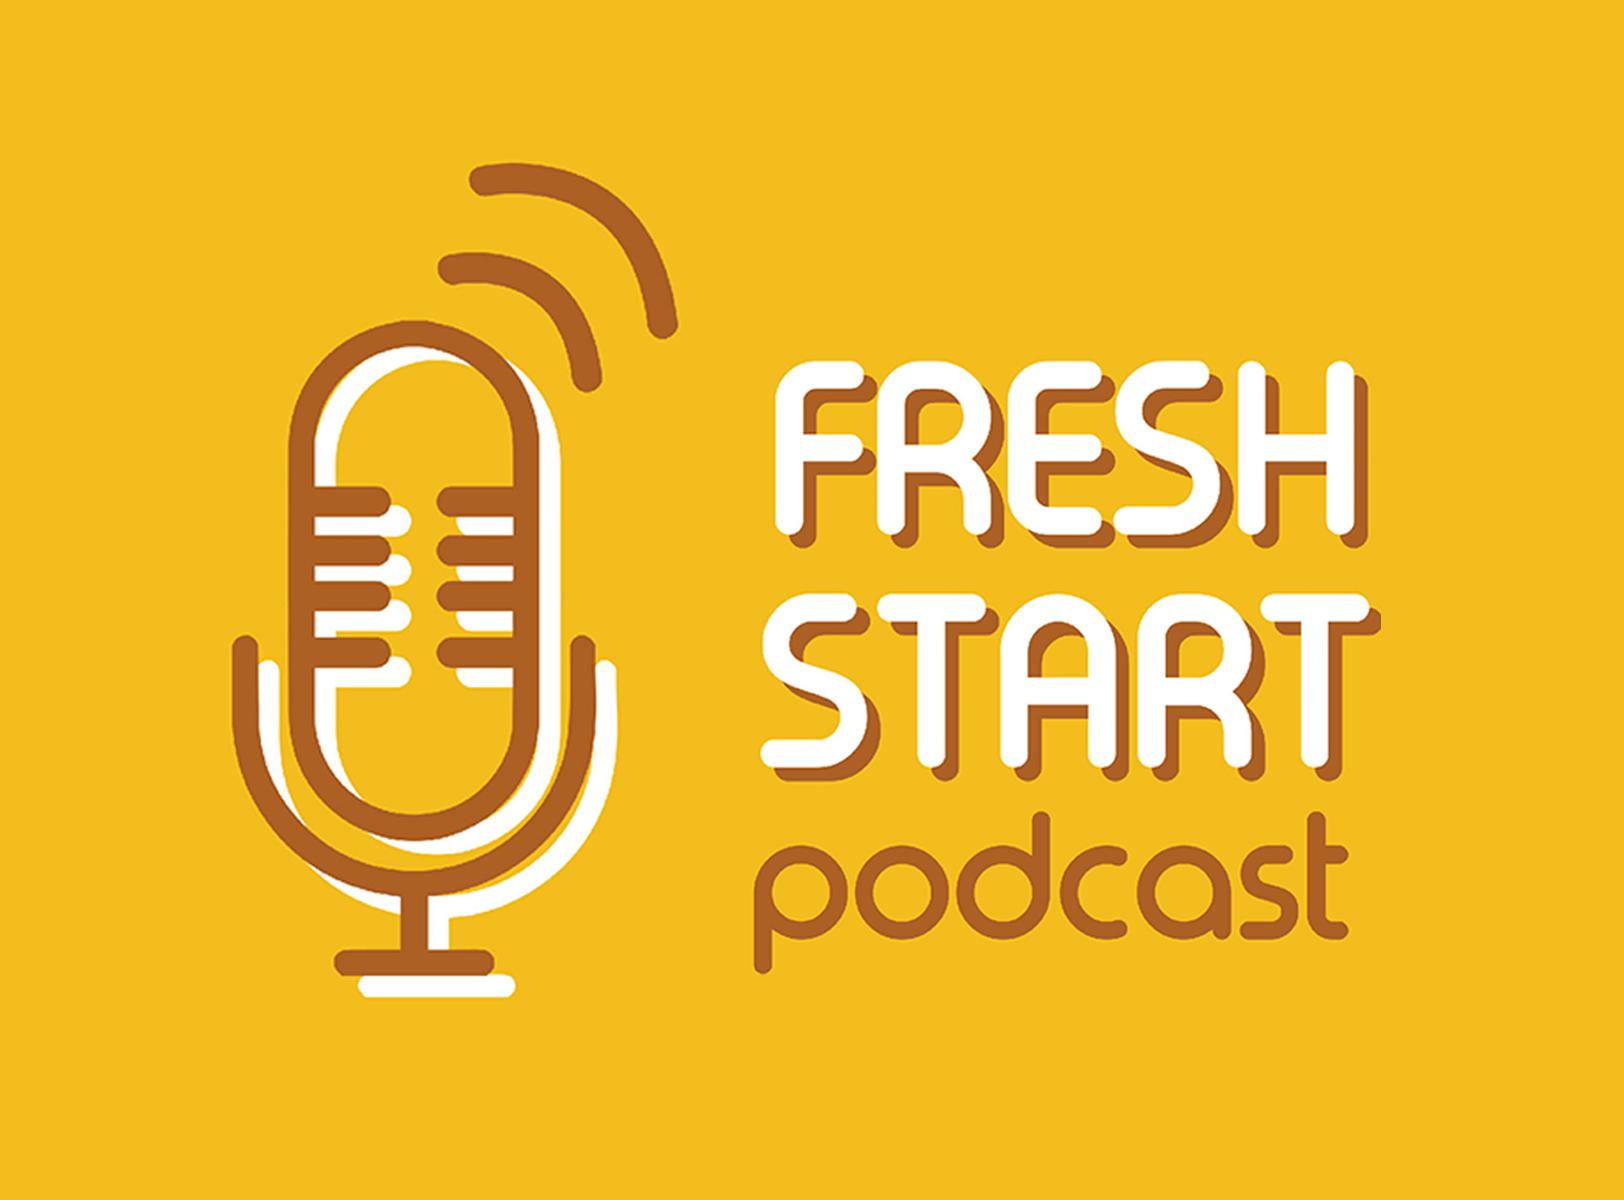 Fresh Start: Podcast News (11/11/2018 Sun.)